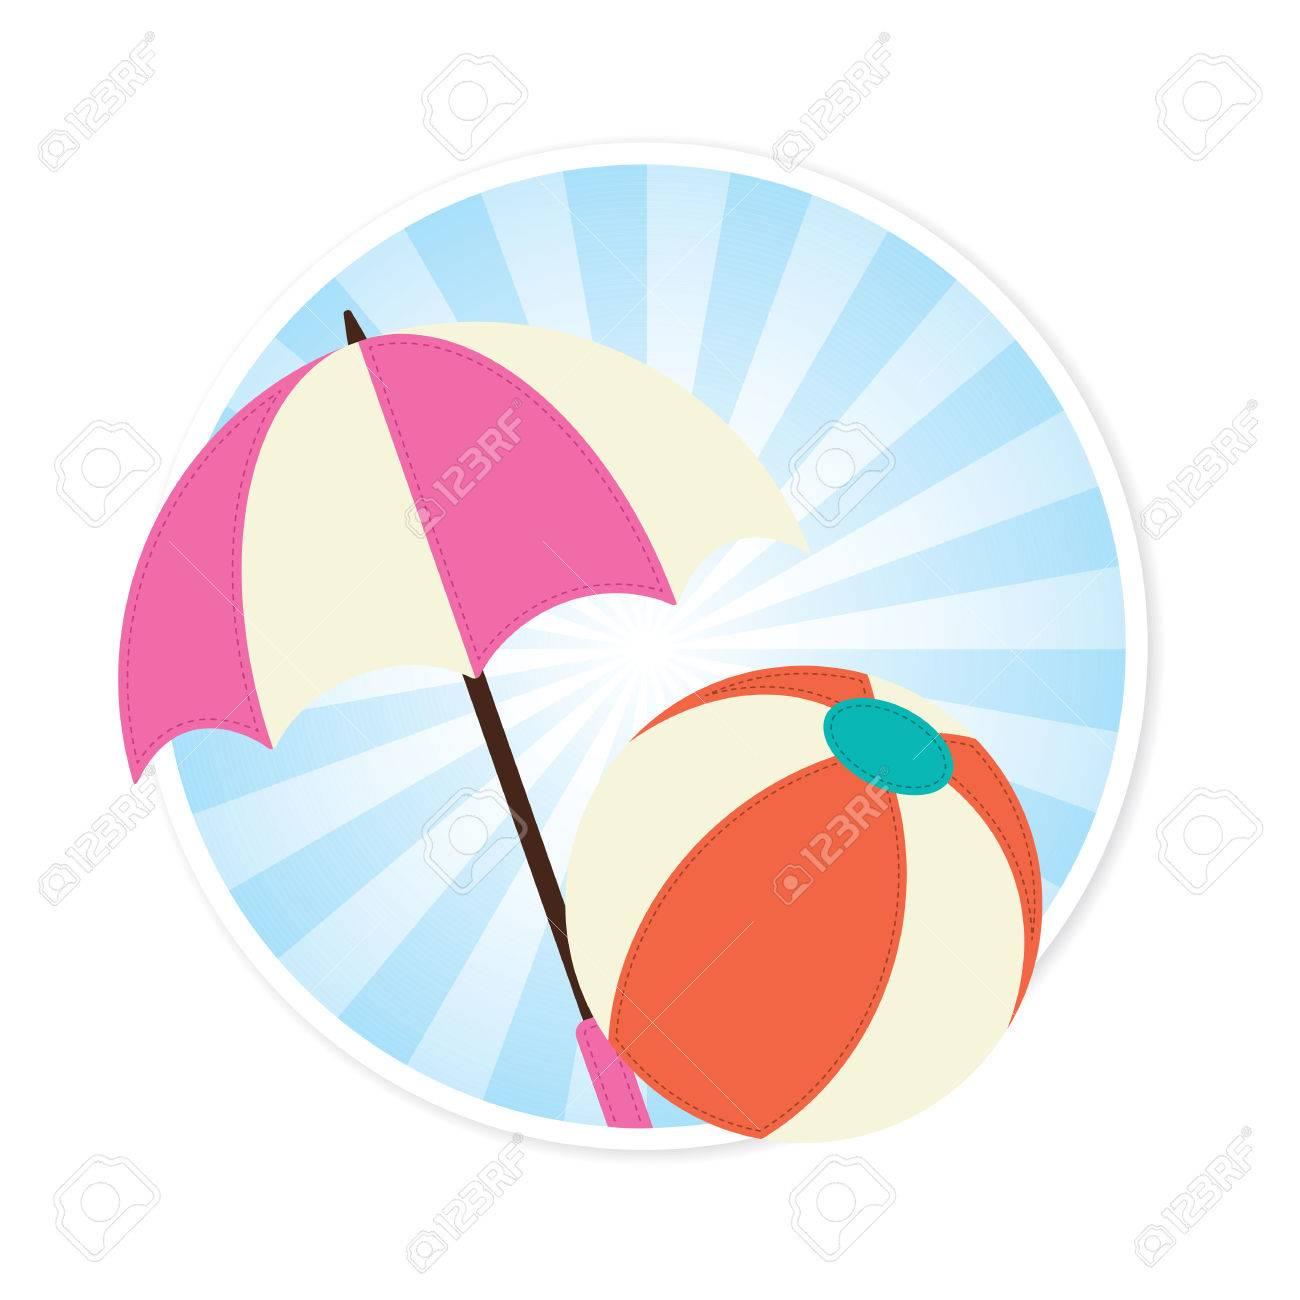 Beach Ball and Sun Umbrella Illustration.